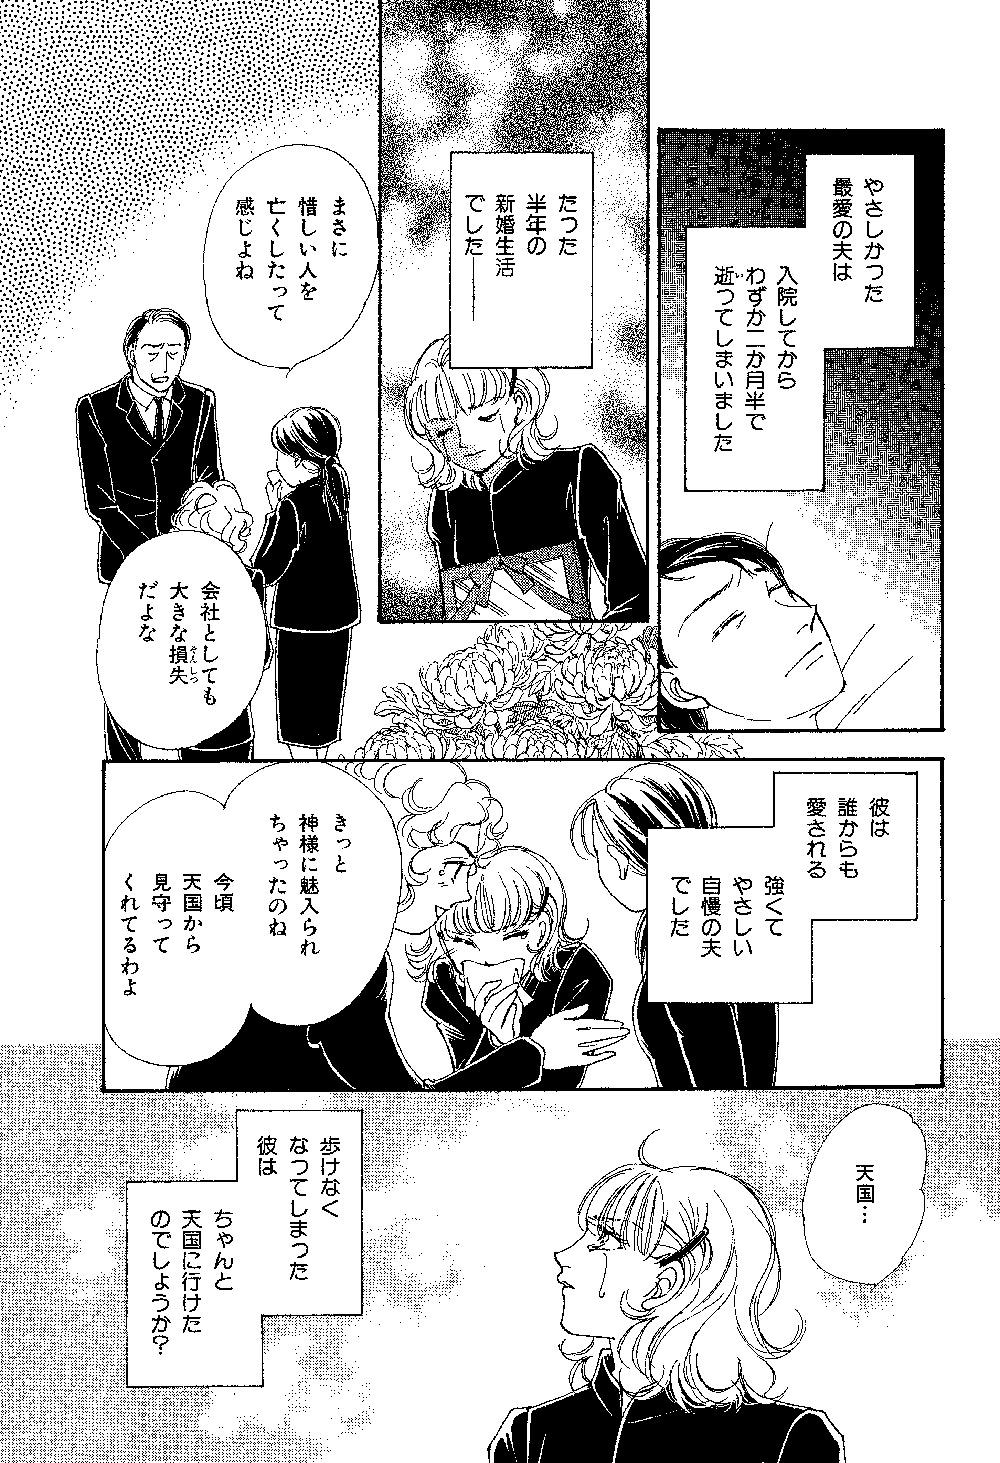 mayuri_0001_0034.jpg